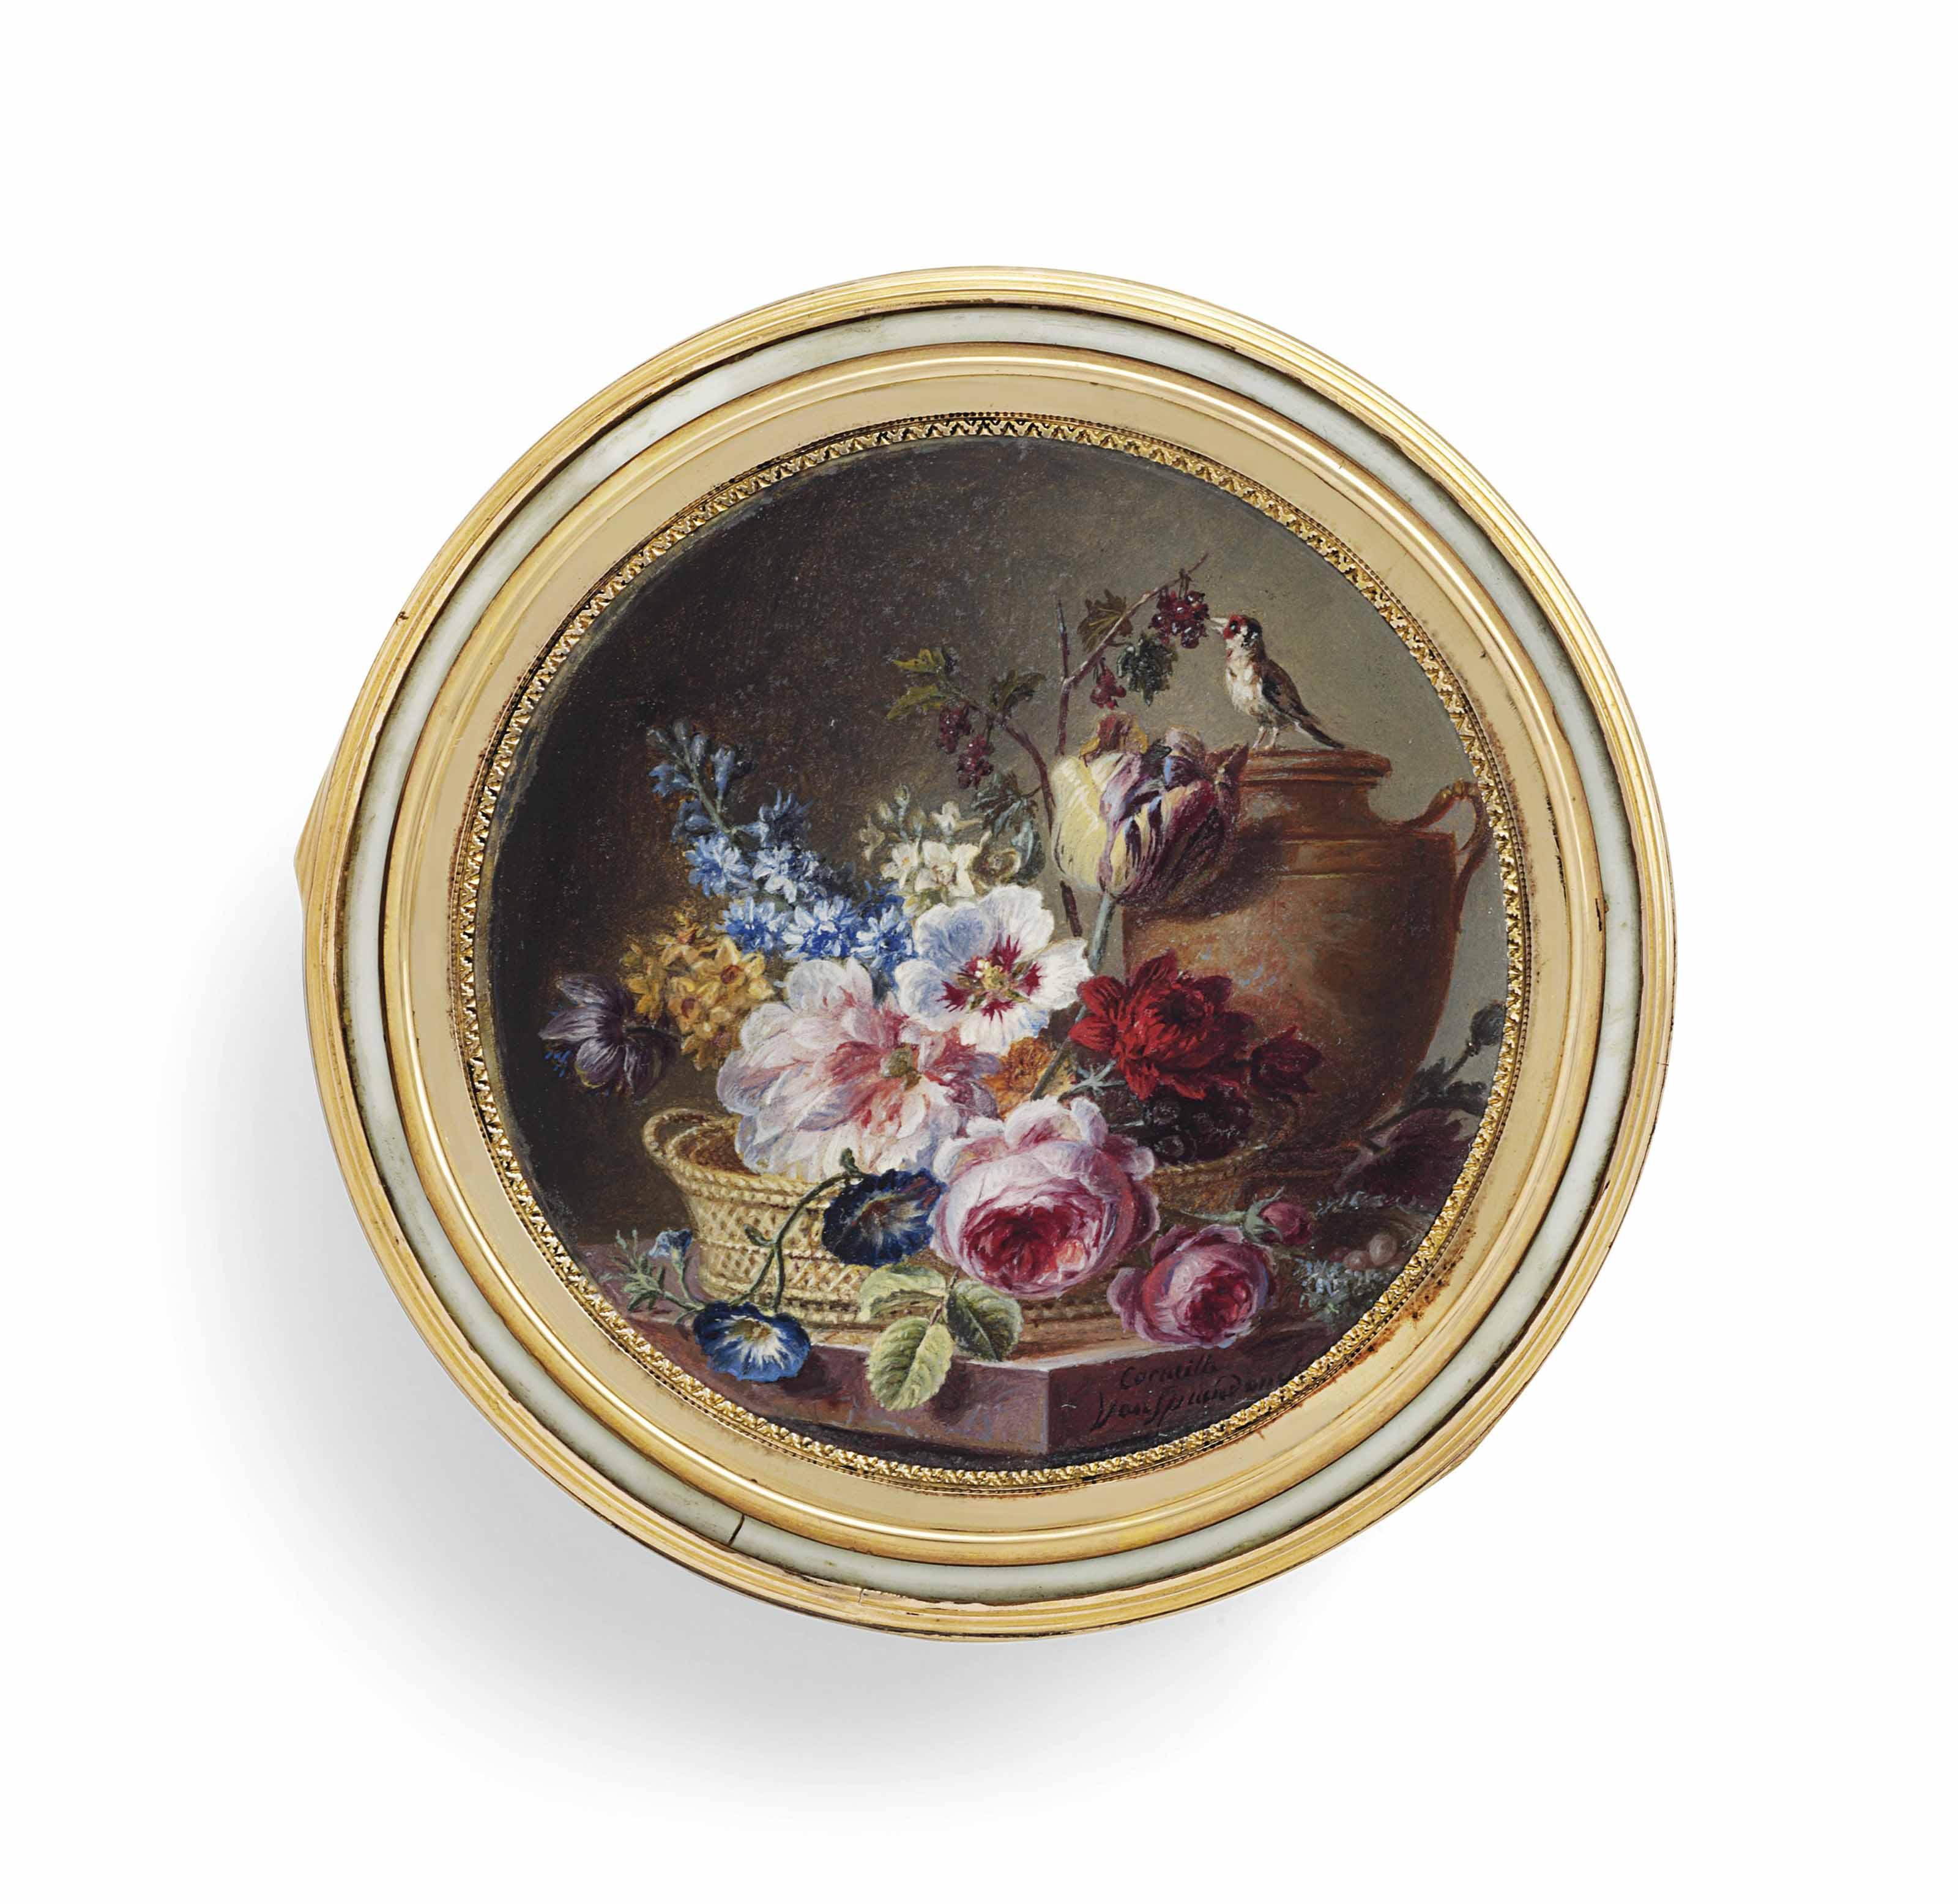 CORNELIS VAN SPAENDONCK (DUTCH, 1756-1840)